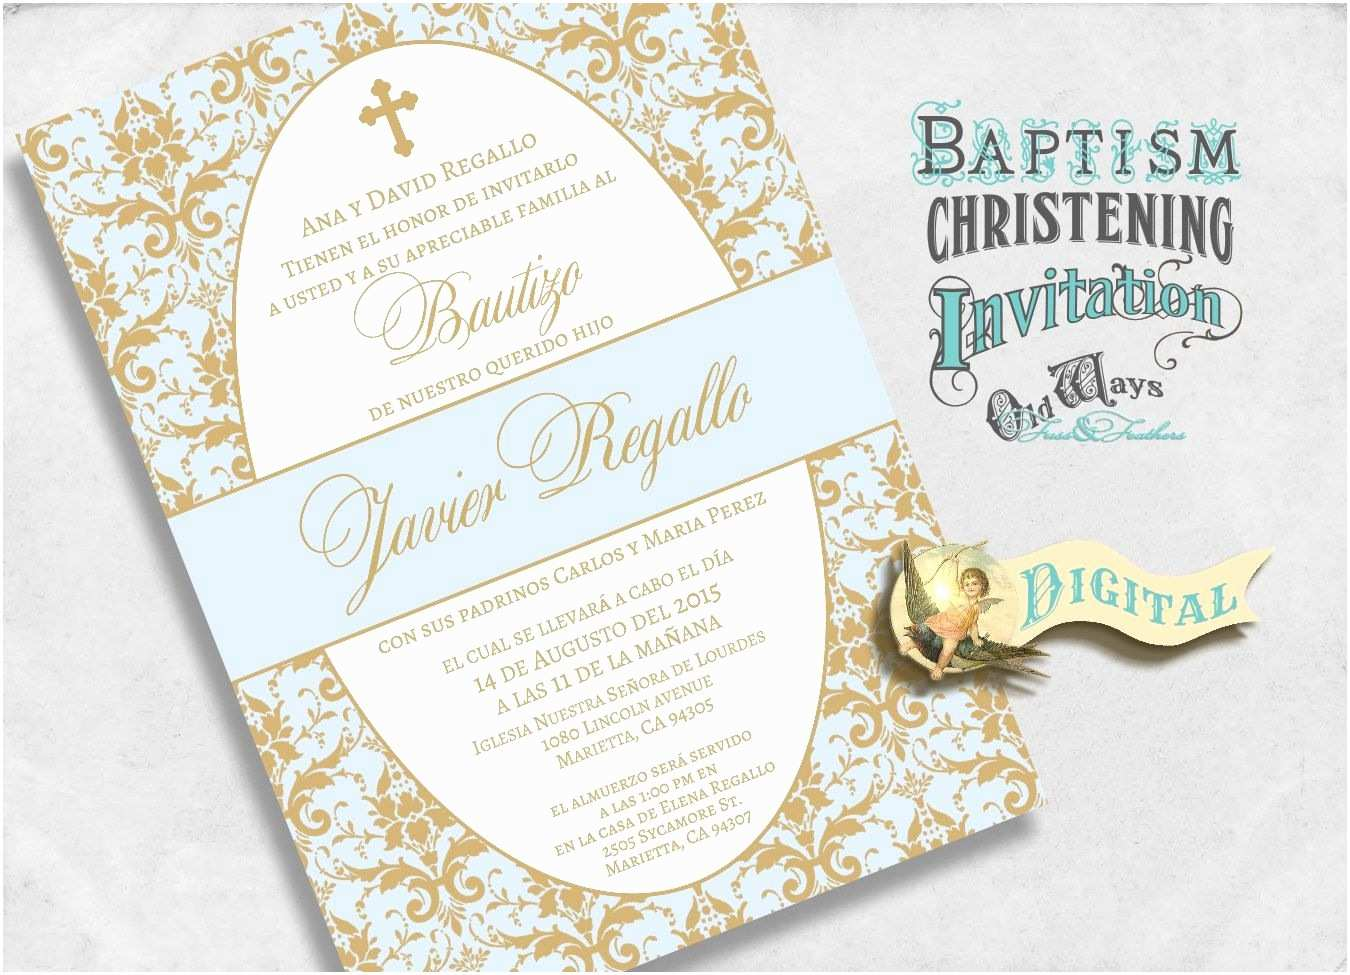 Diy Baptism Invitations Diy Baptism Invitations Baptism Invitation Templates